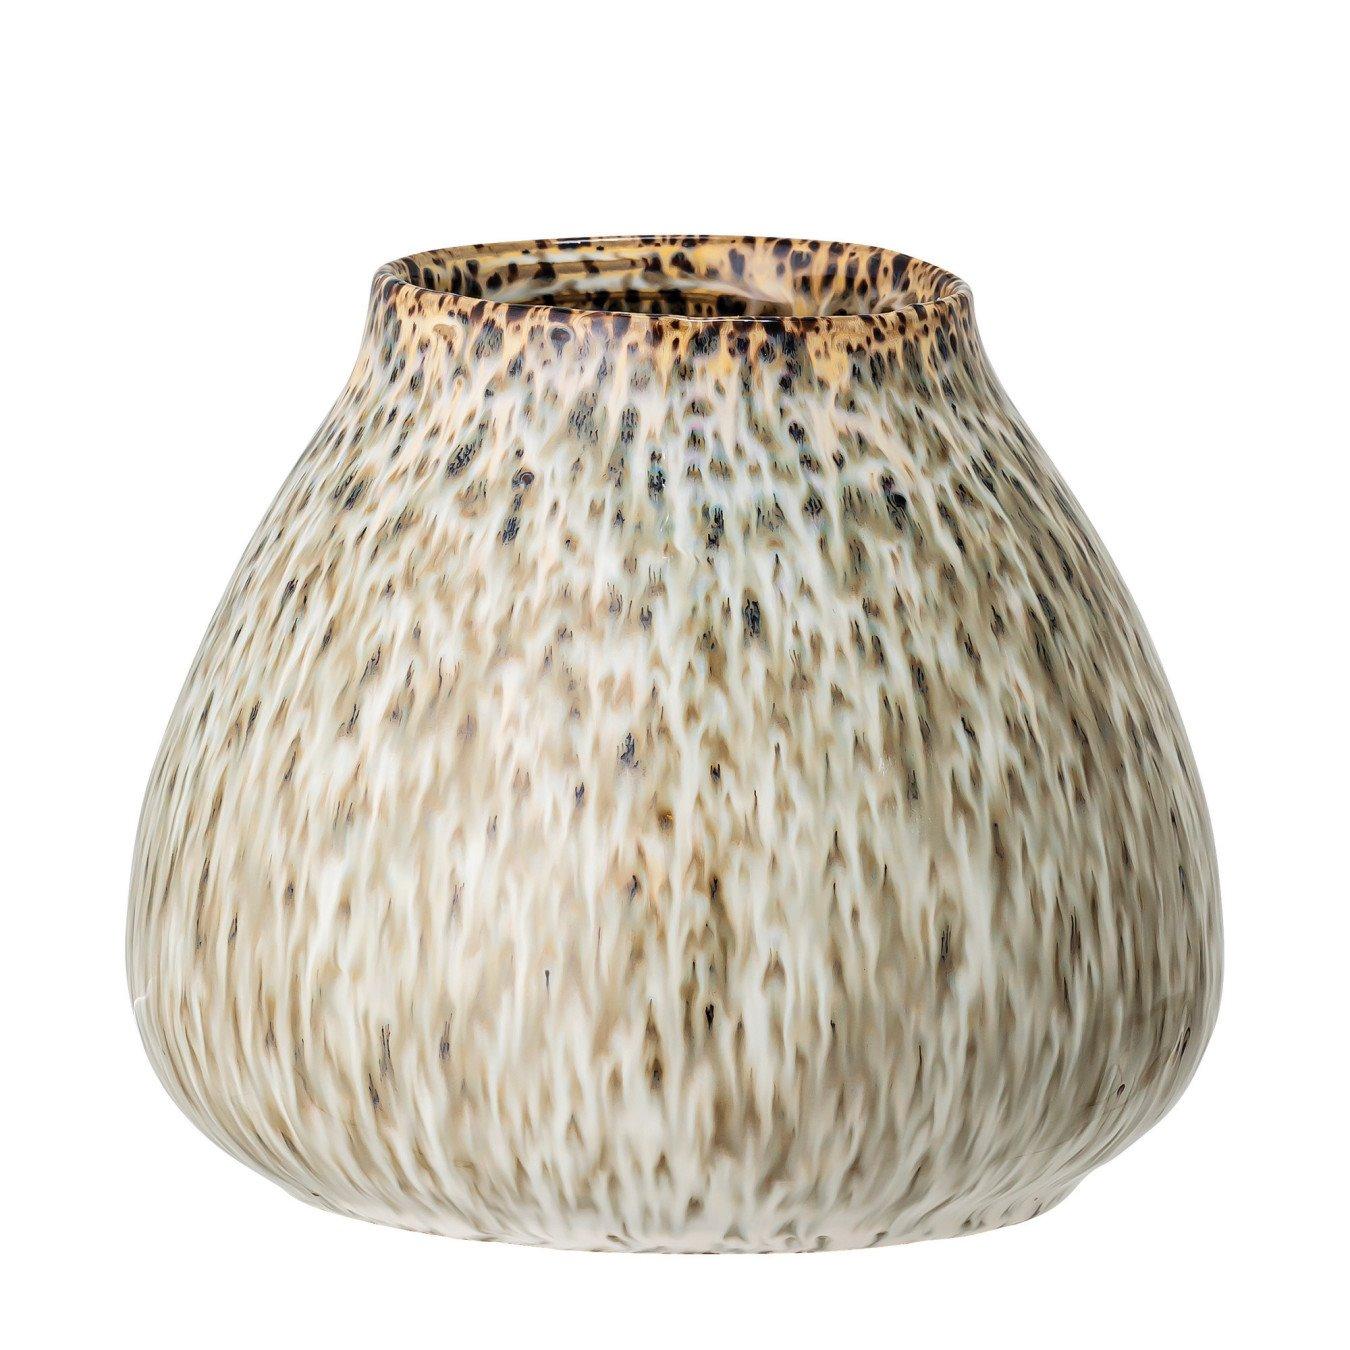 Green Speckled Reactive Glaze Stoneware Vase